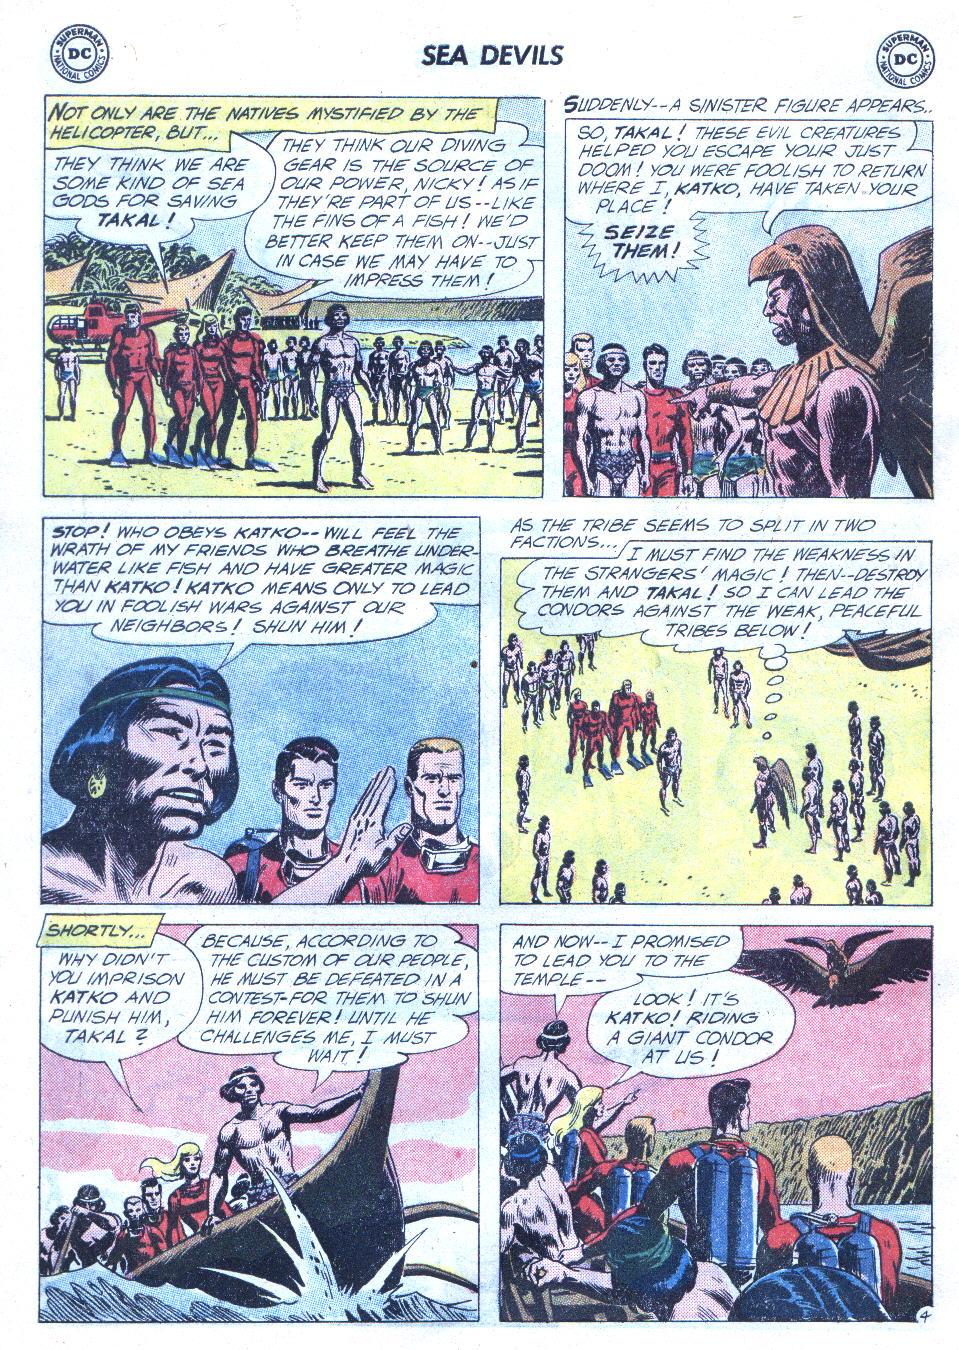 Read online Sea Devils comic -  Issue #4 - 23